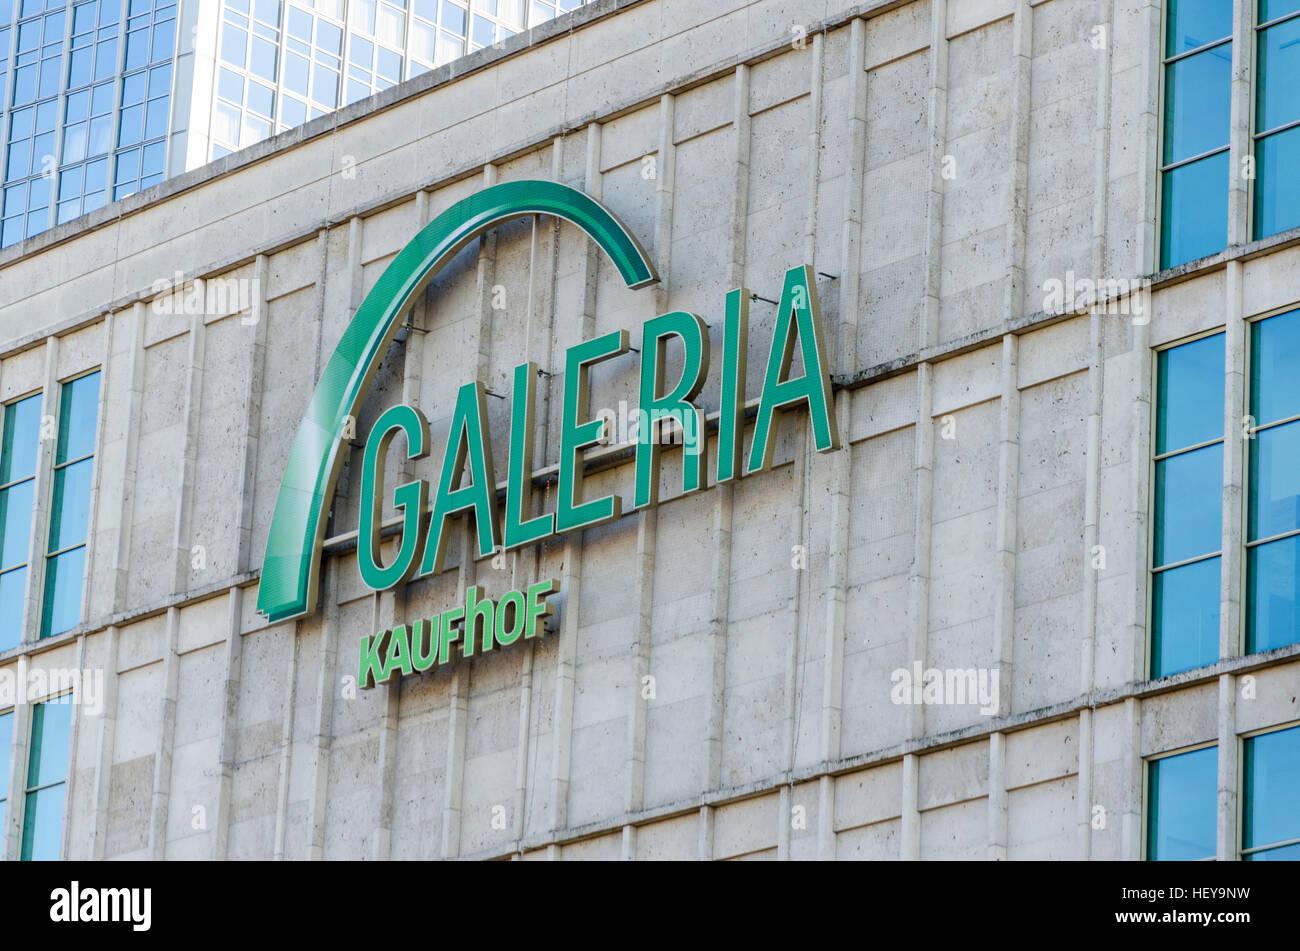 Signe extérieur Logo Galeria Kaufhof, grand magasin, boutique, détaillant. Alexanderplatz, Mitte, Berlin, Photo Stock